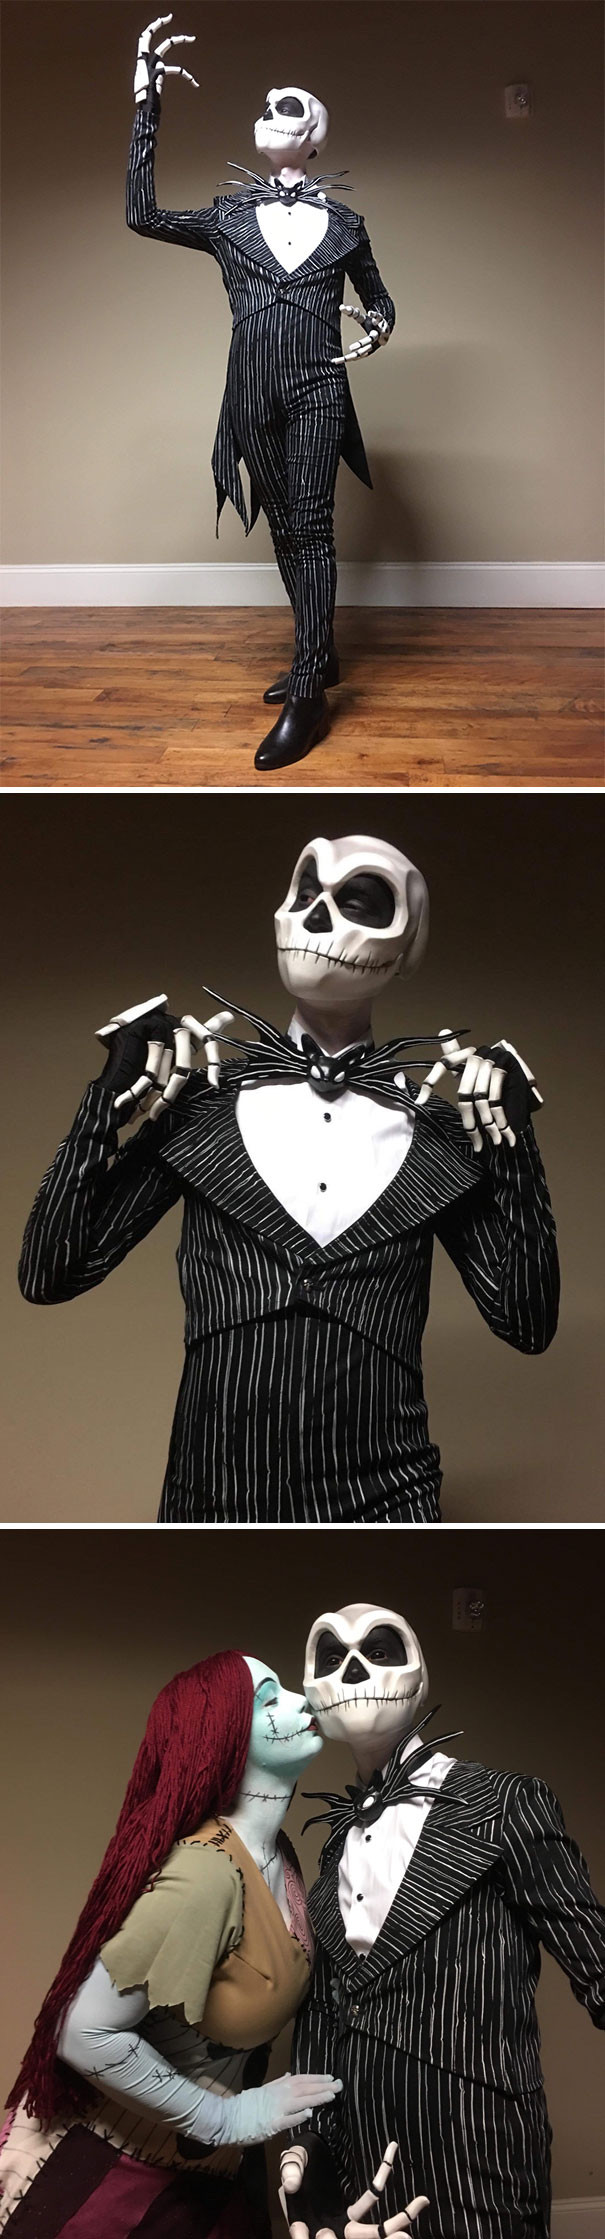 halloween-costume-ideas-2018-19-5bd6c8ead461e__605